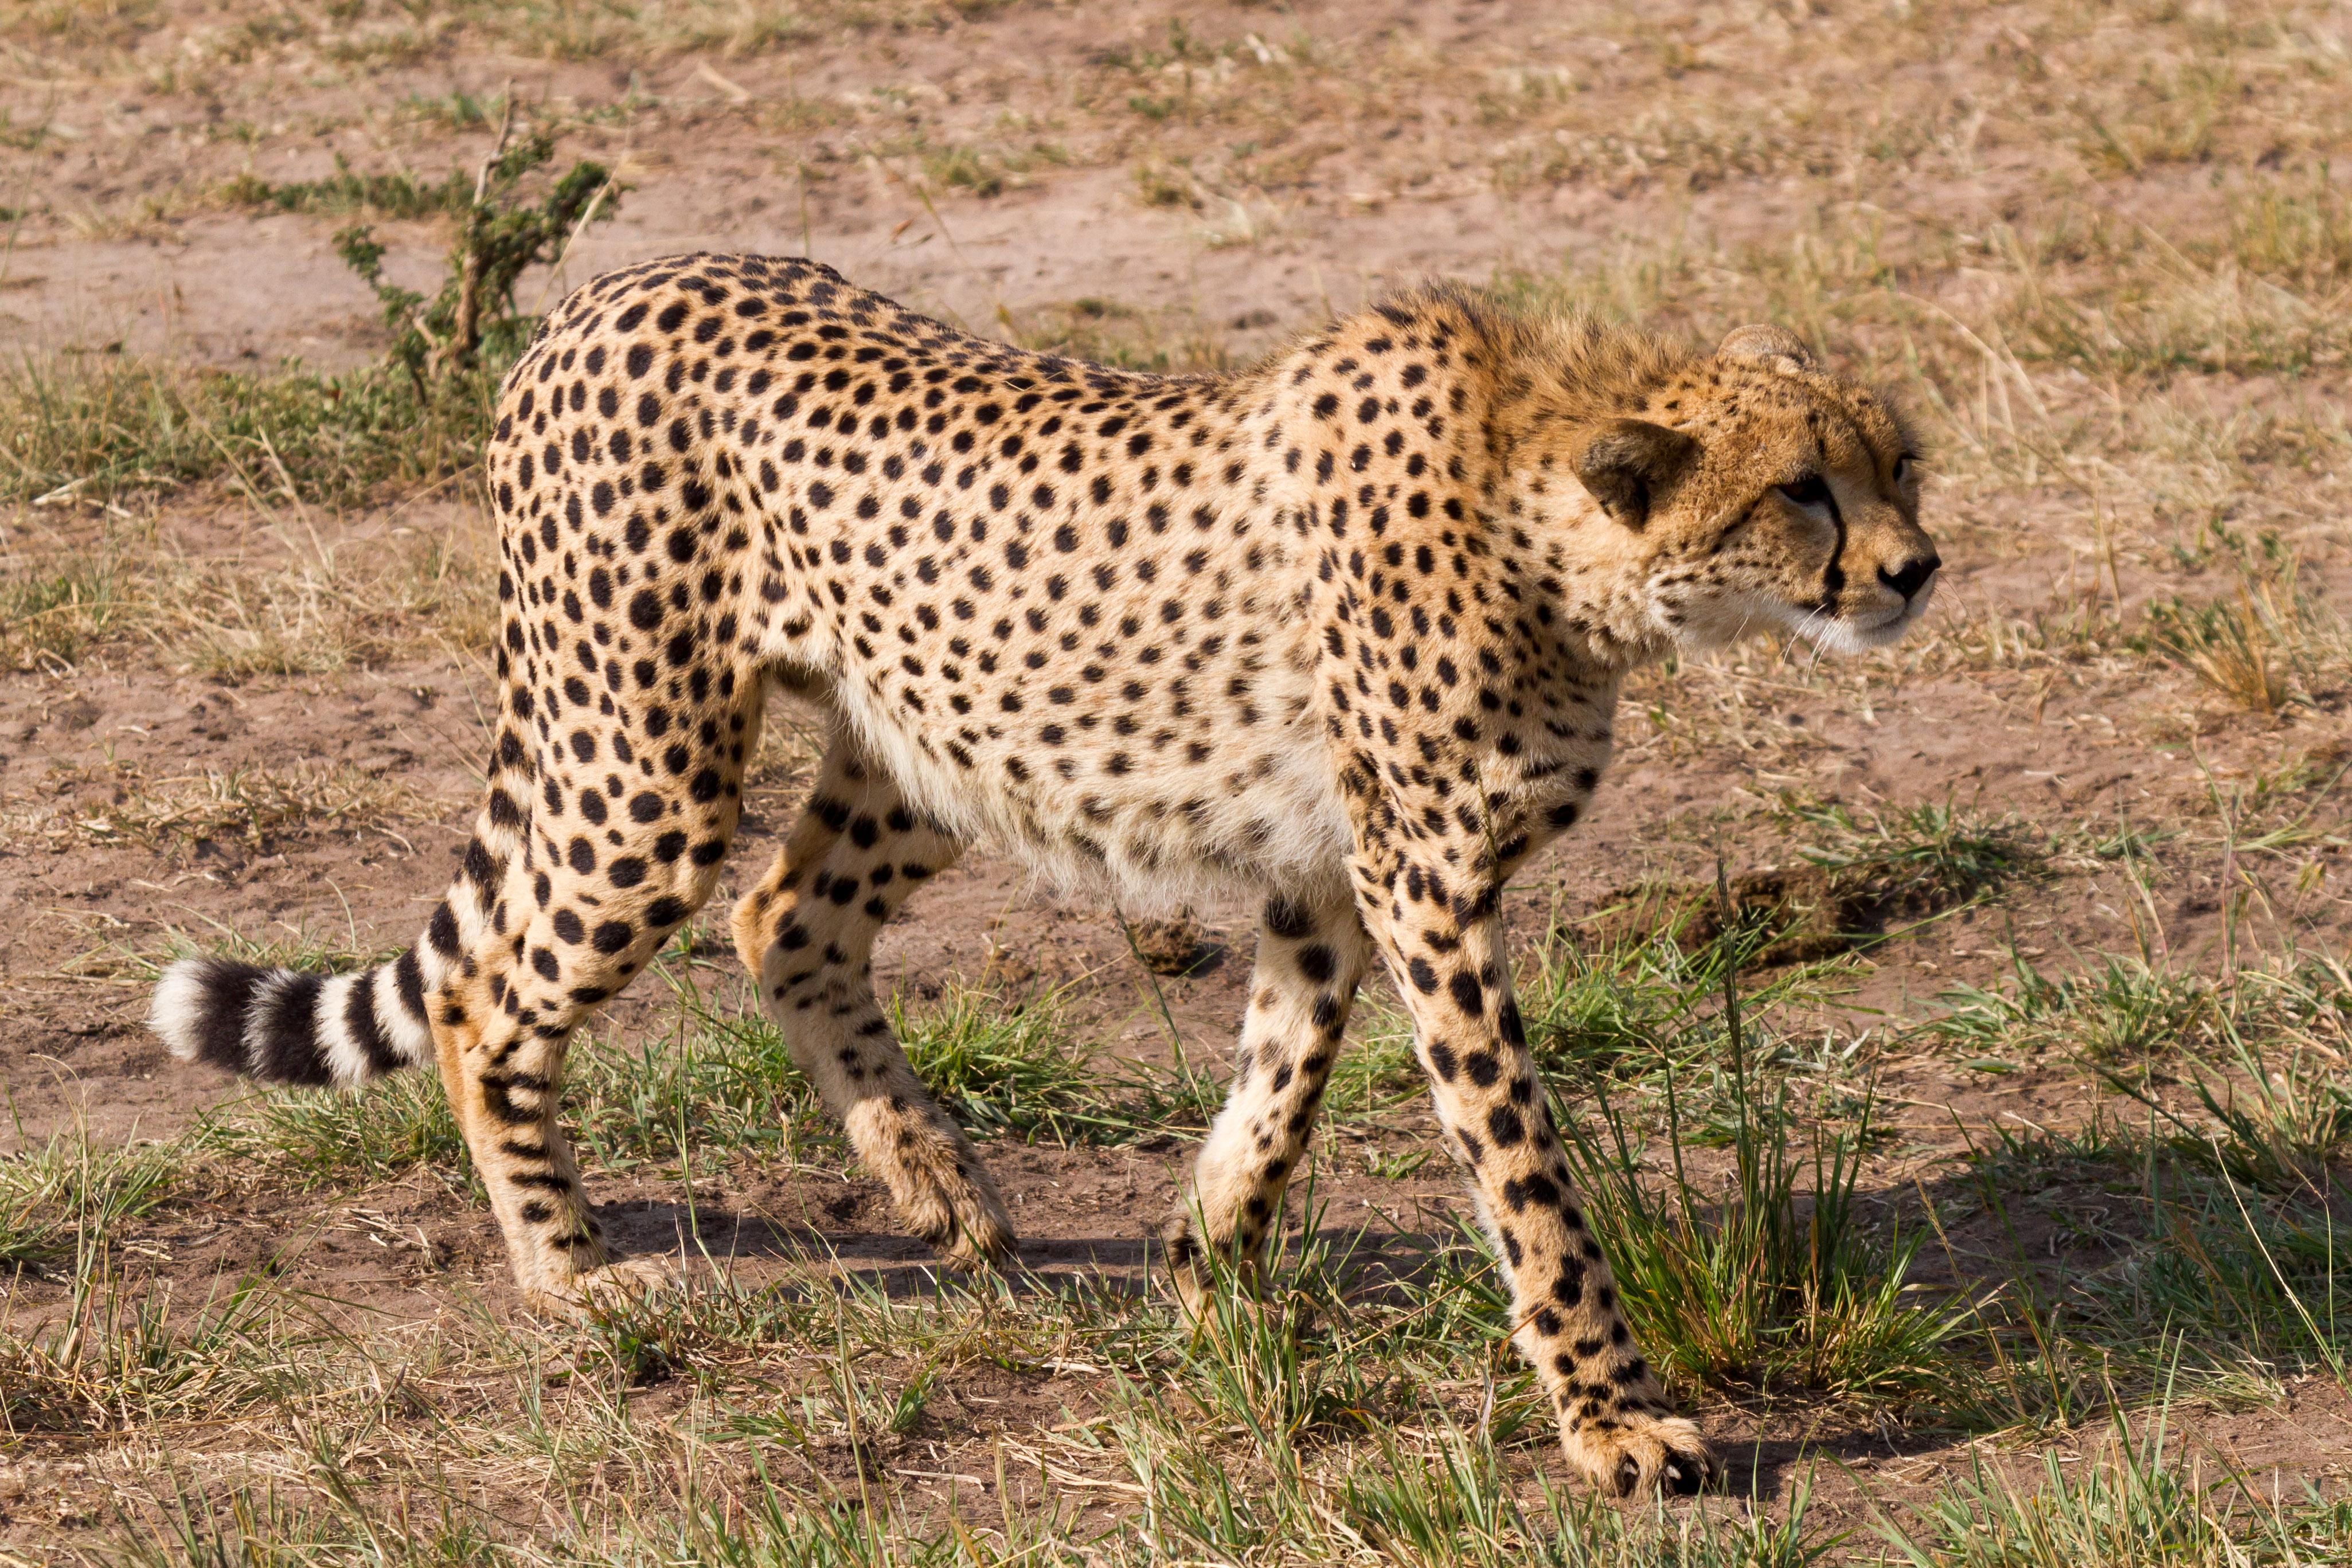 File:Hunting Cheetah.jpg - Wikimedia Commons | 4102 x 2735 jpeg 3483kB